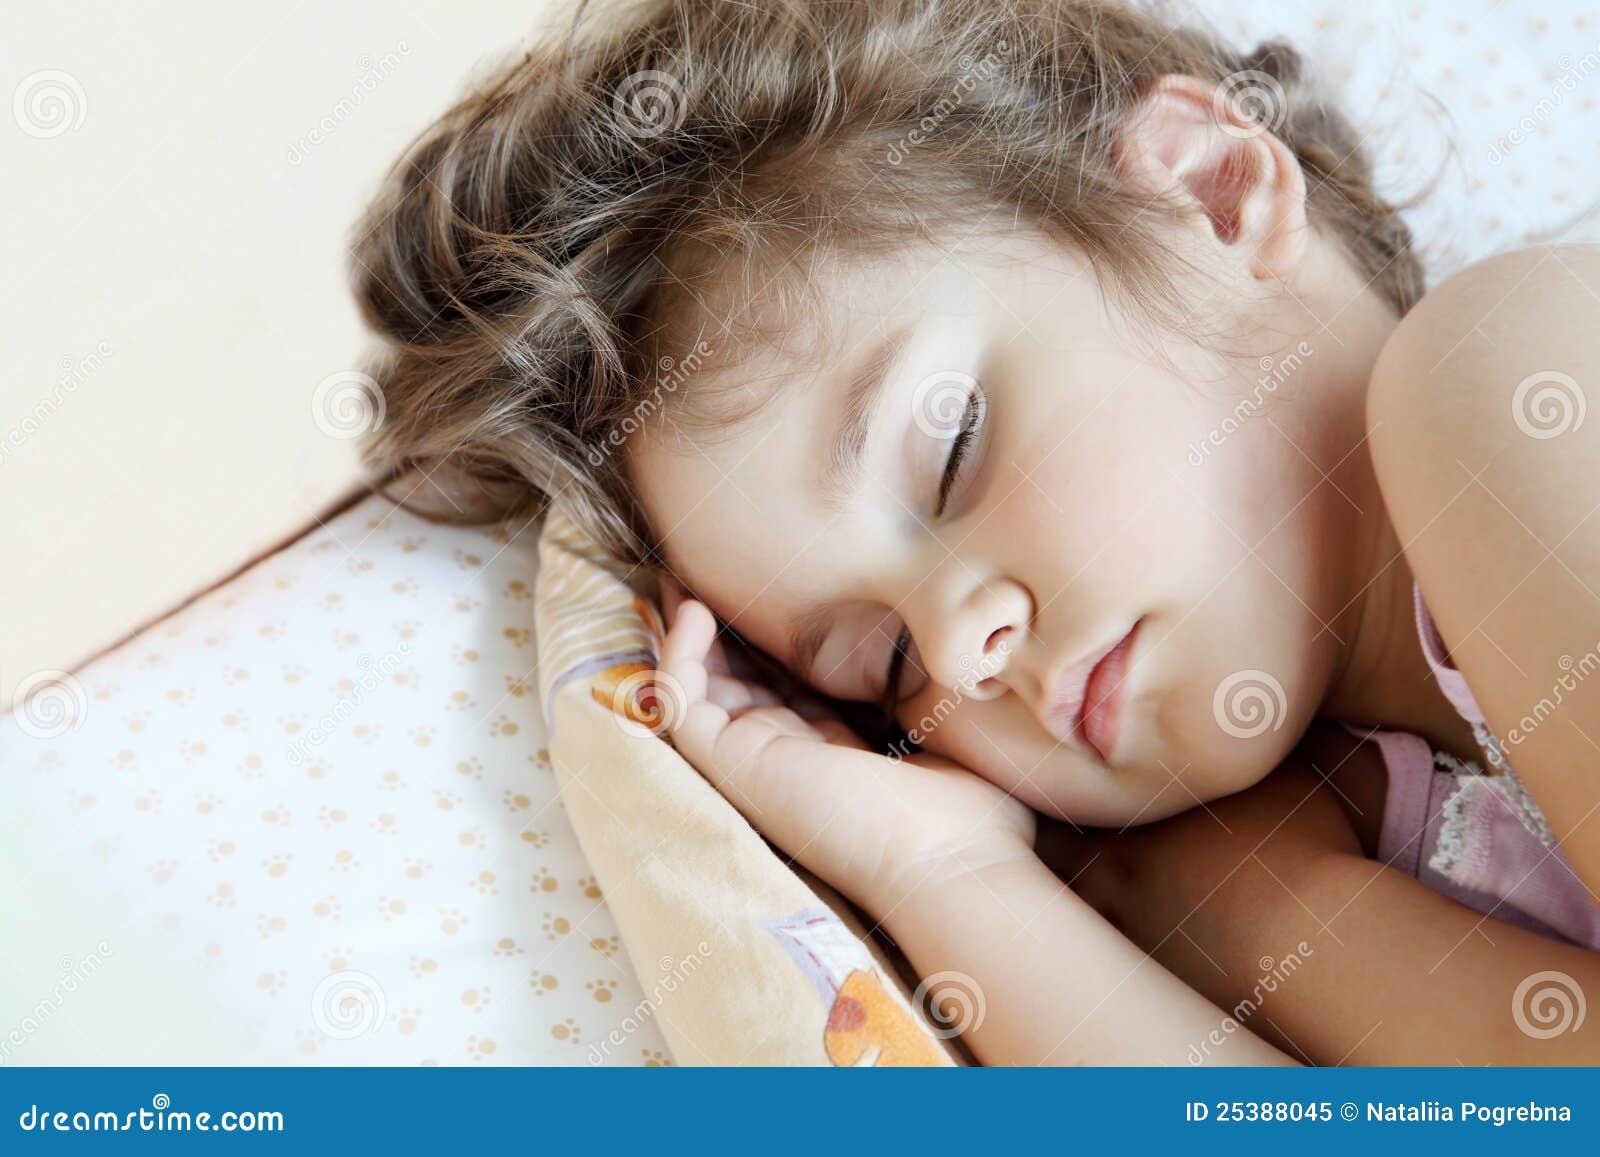 dormida dominant